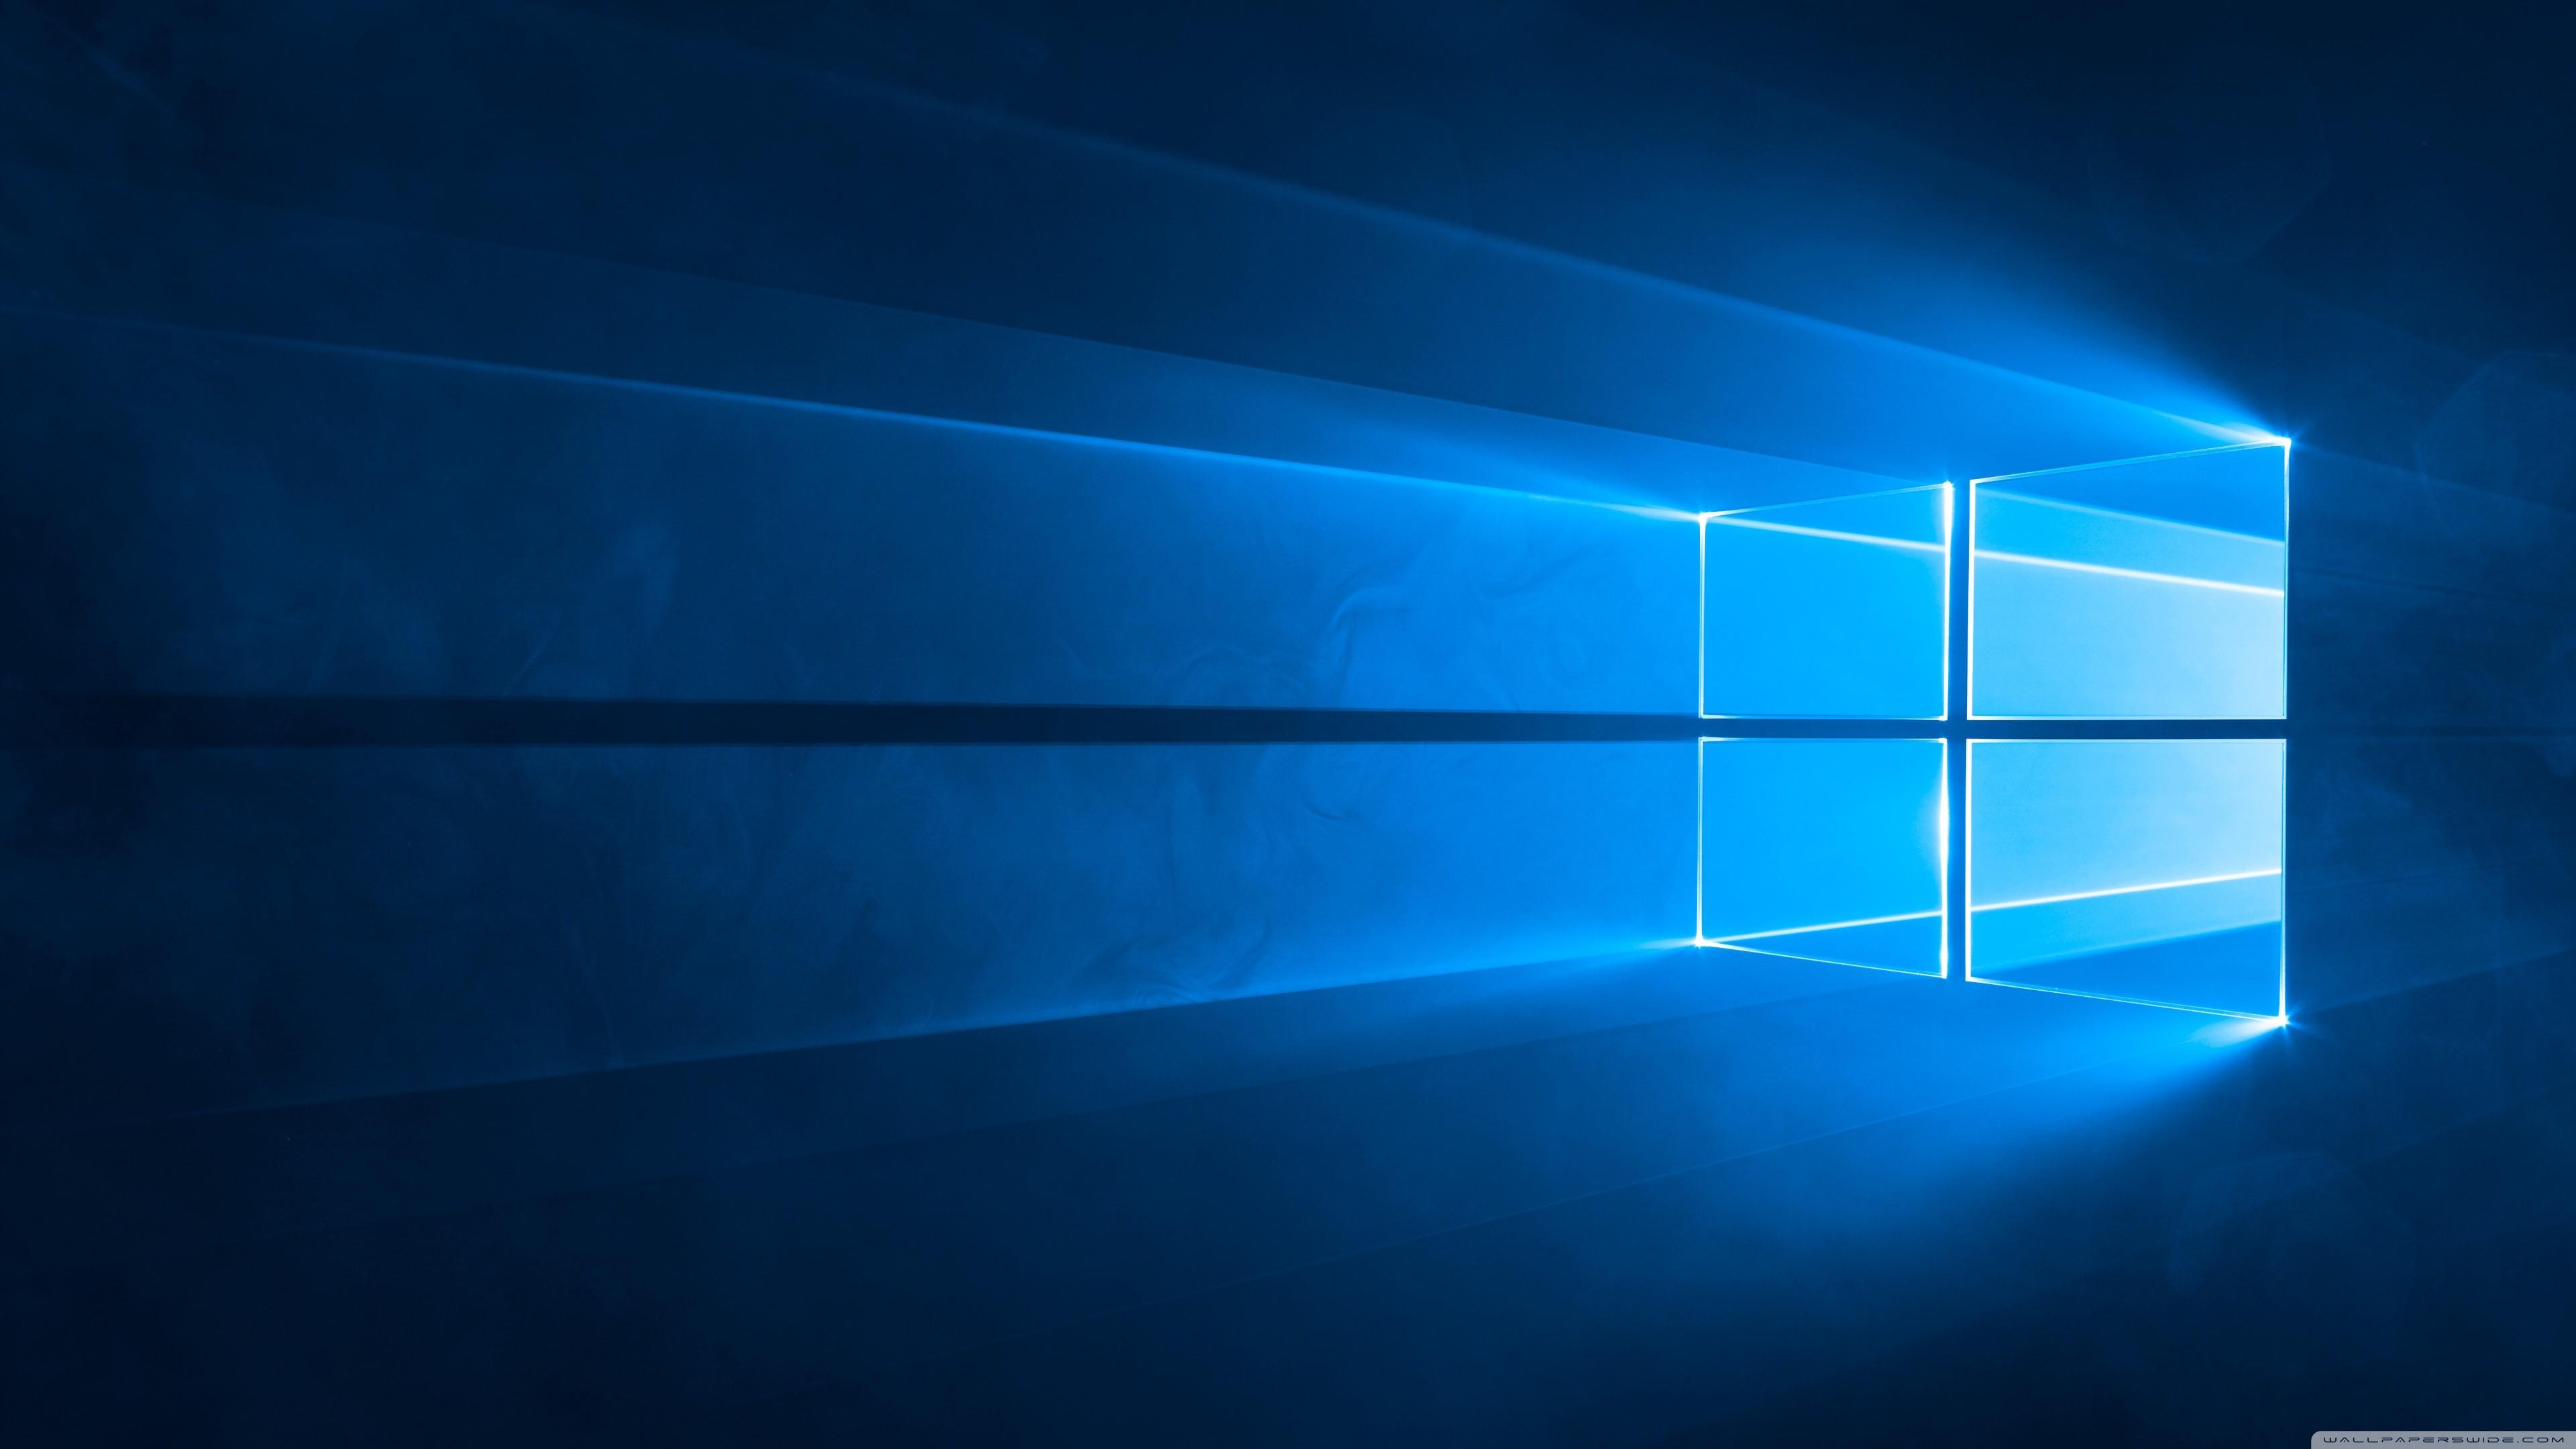 4K Windows 10 Wallpaper 61 images 3840x2160